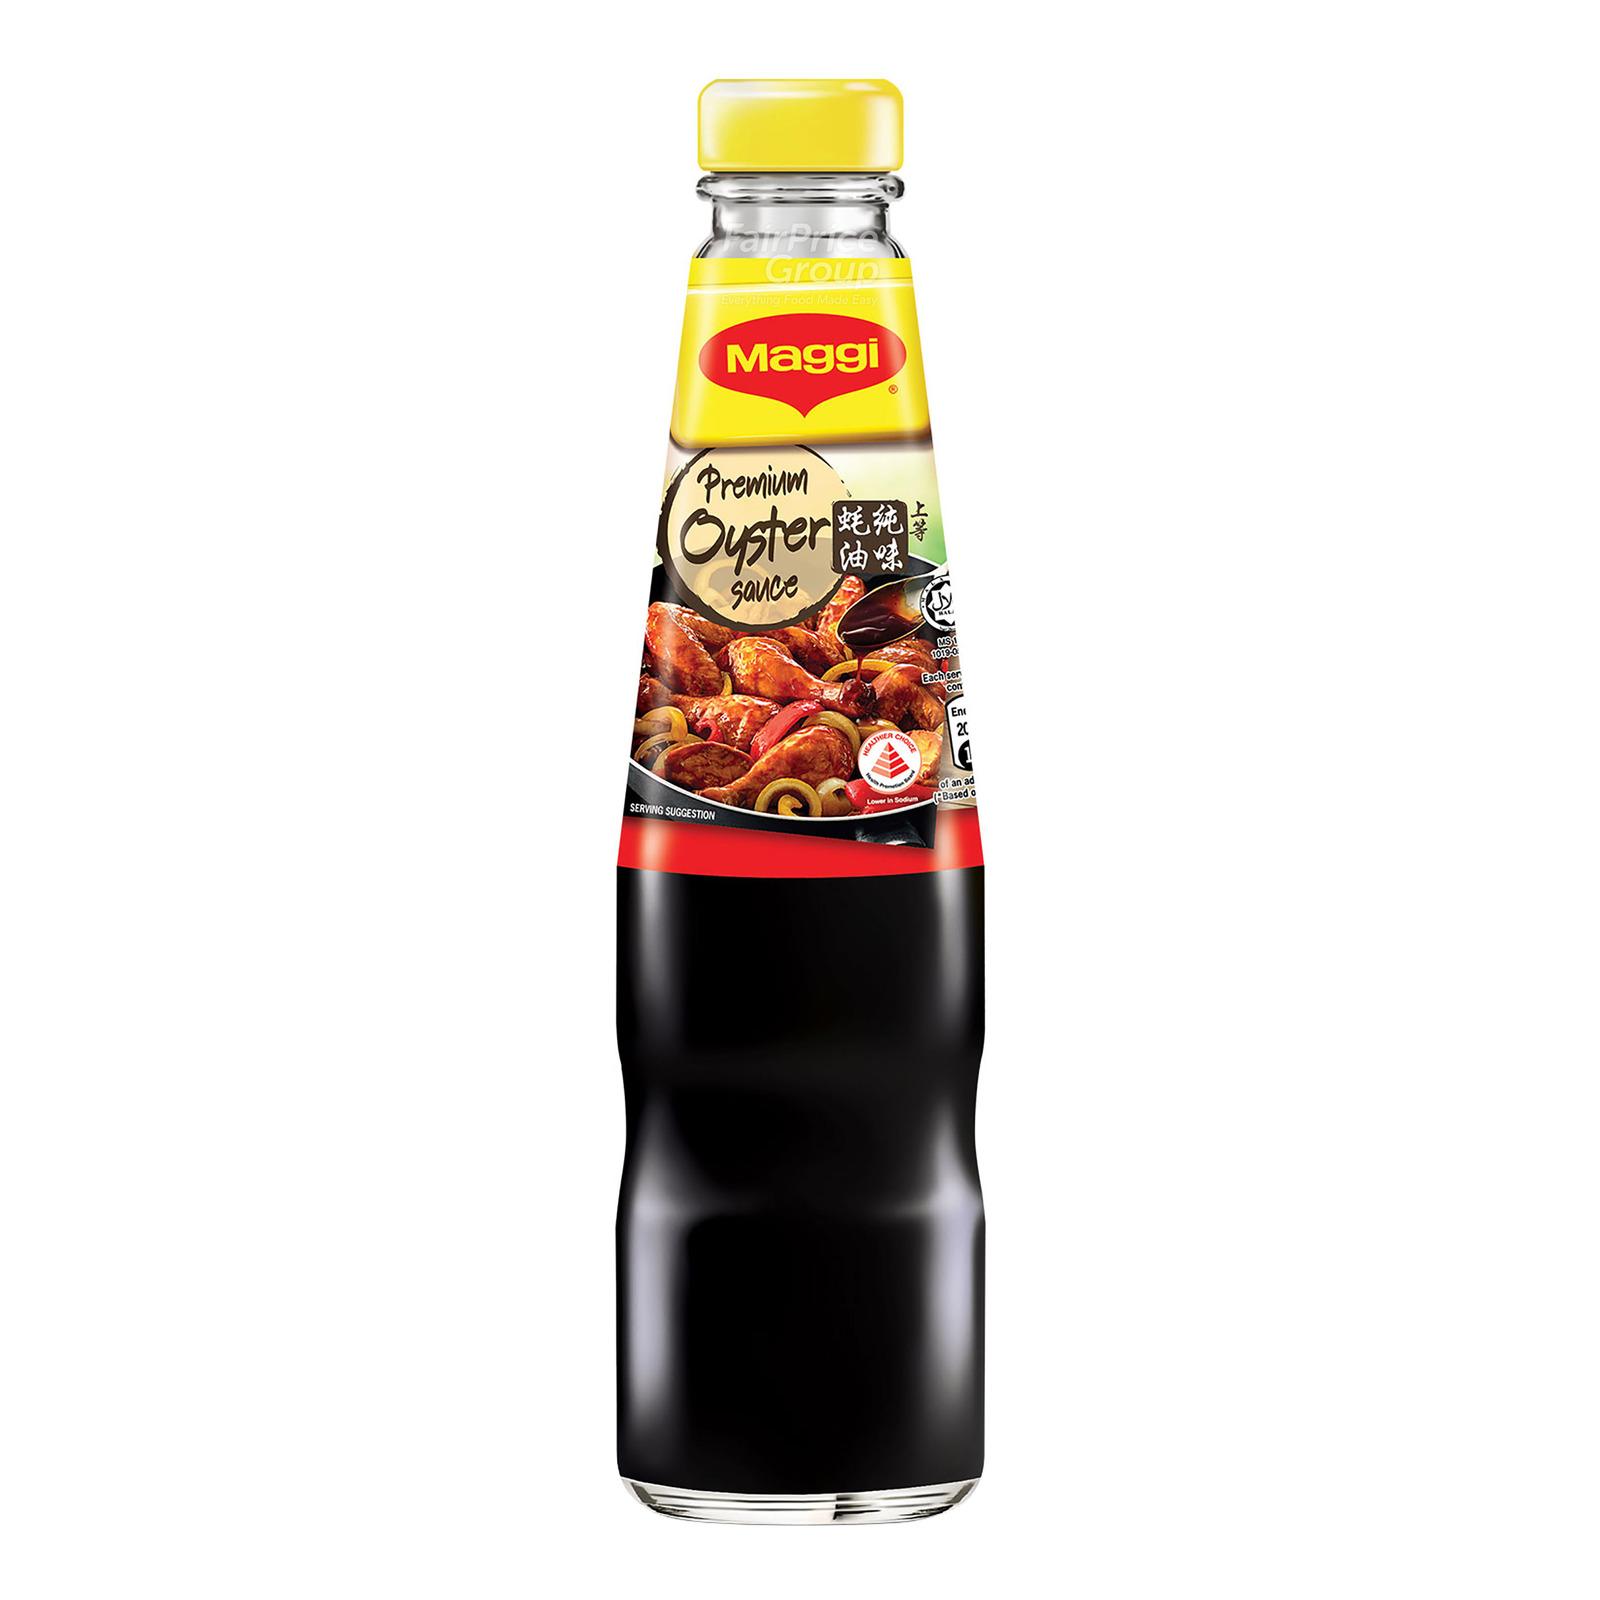 Maggi Hcs Pre.Oyster Sauce 500G